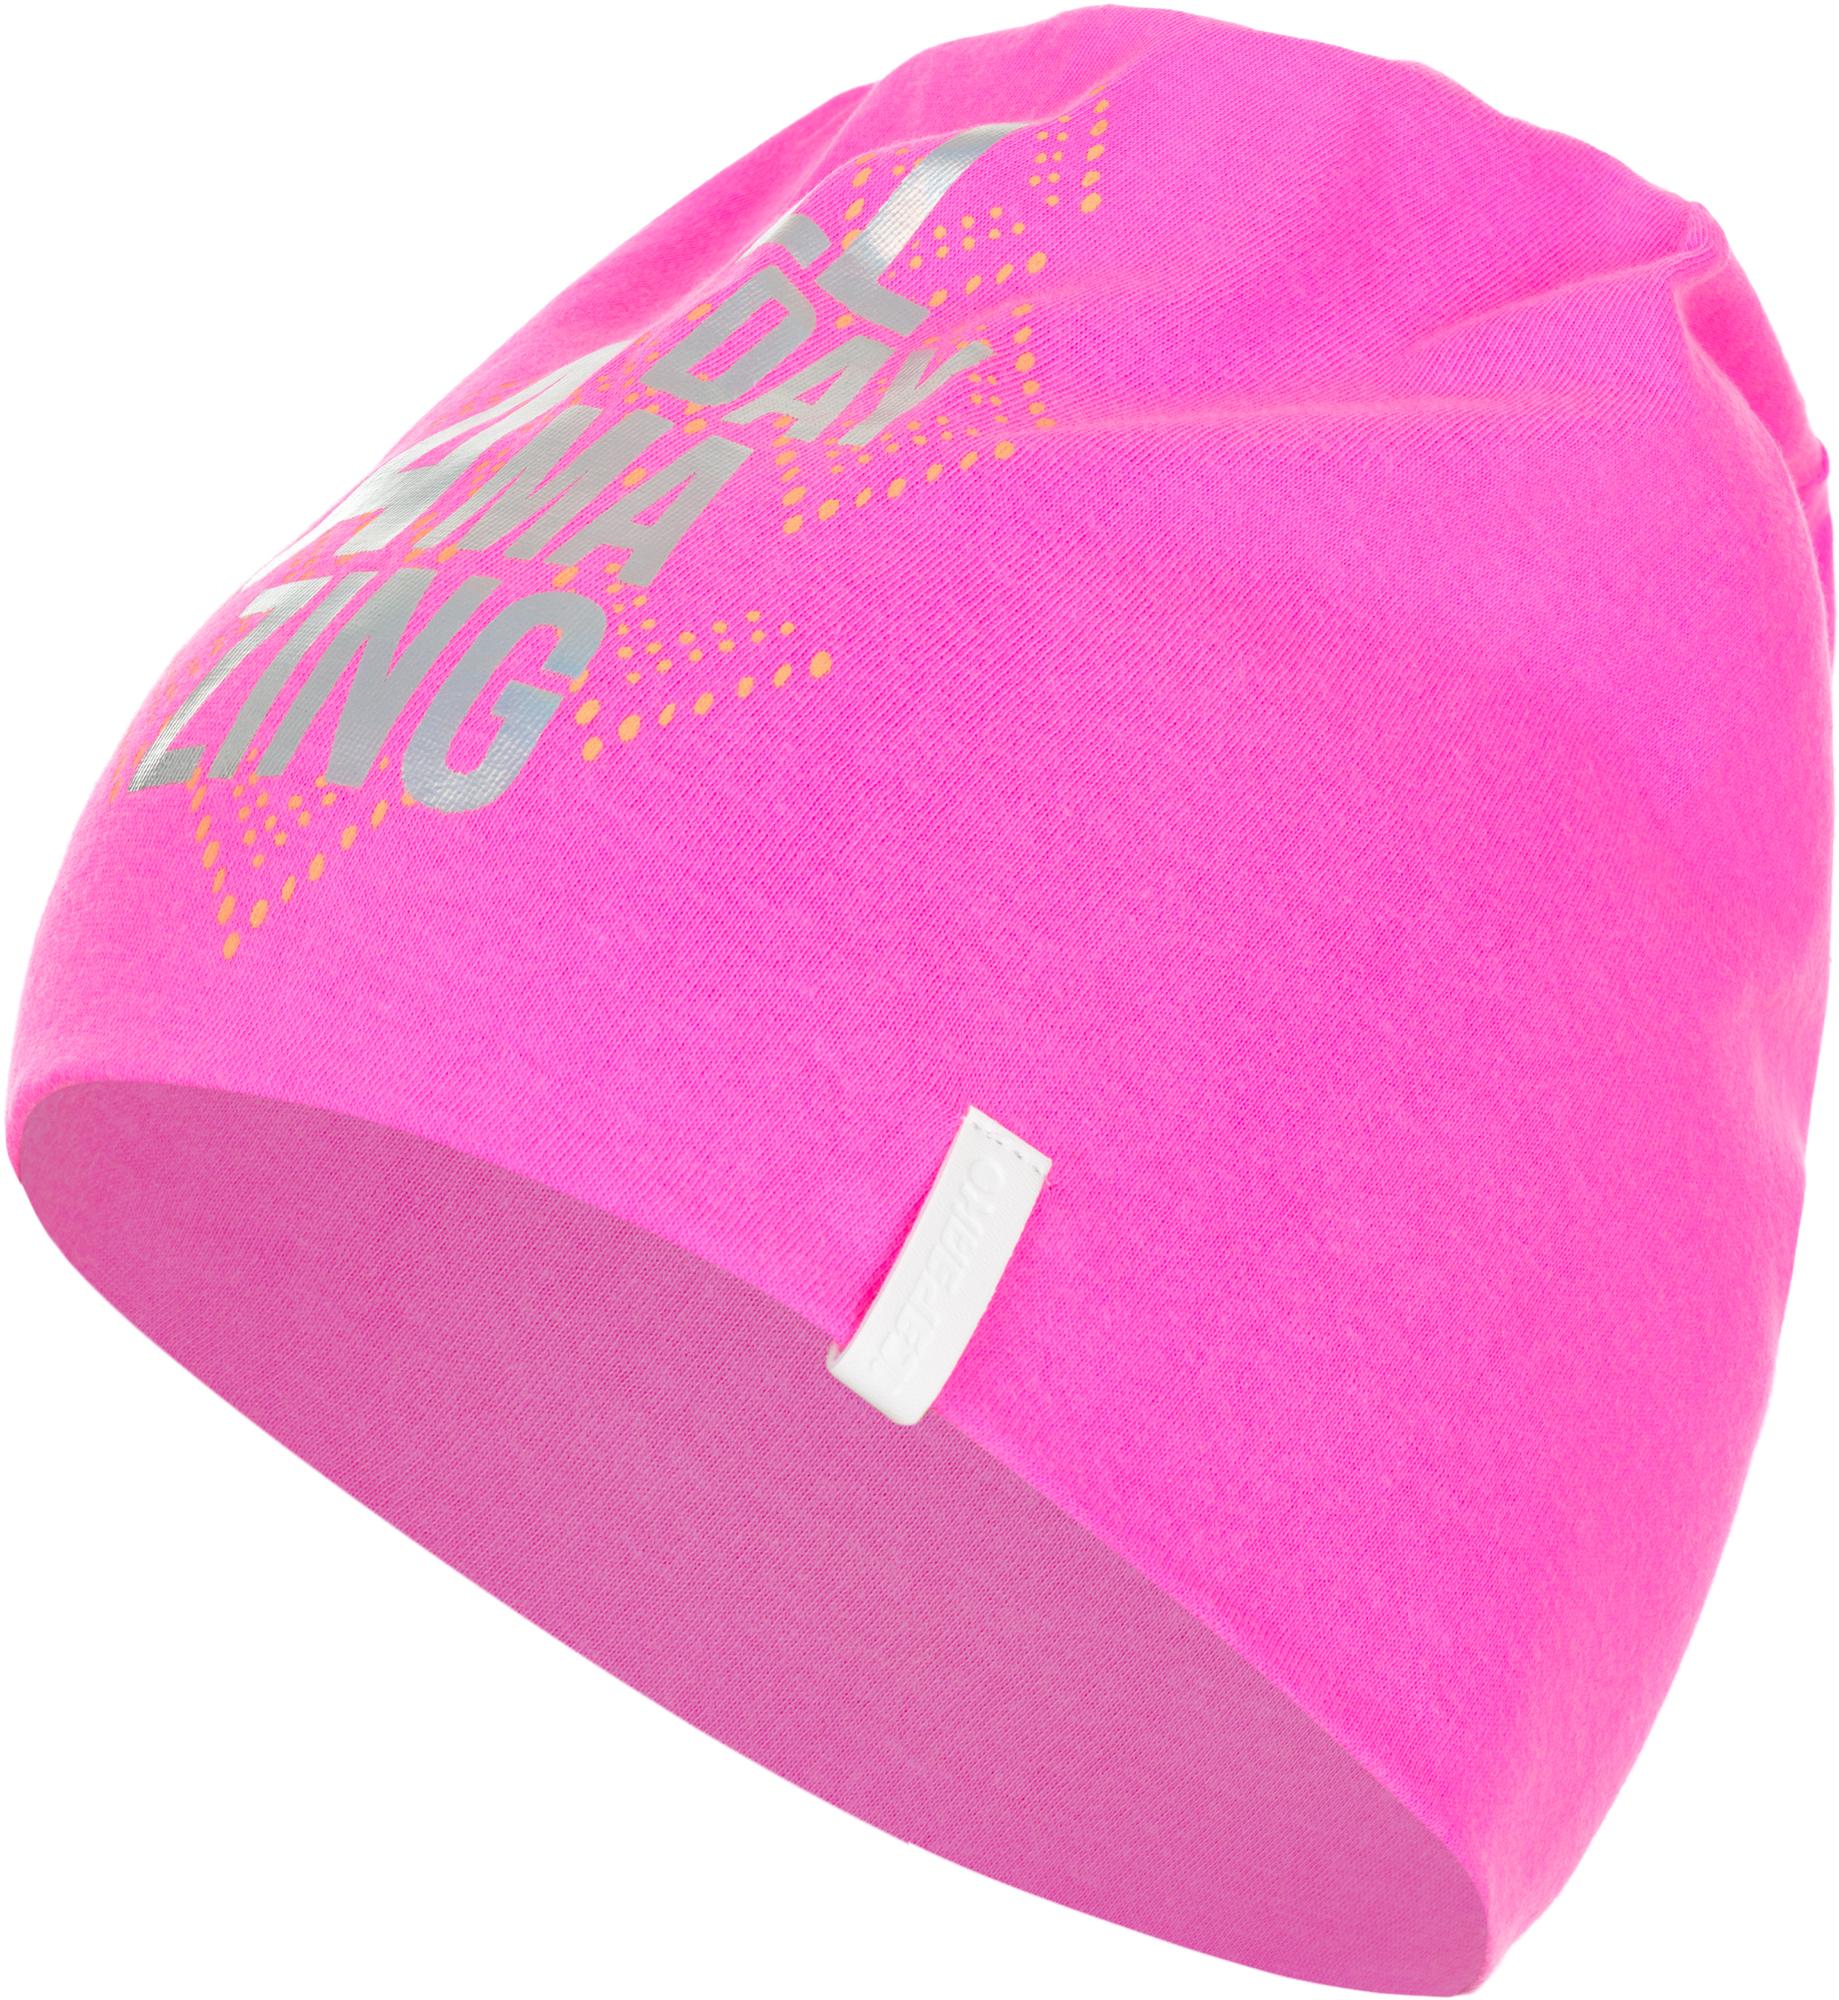 IcePeak Шапка для девочек IcePeak Hapsu, размер Без размера icepeak шапка мужская icepeak iolo размер без размера